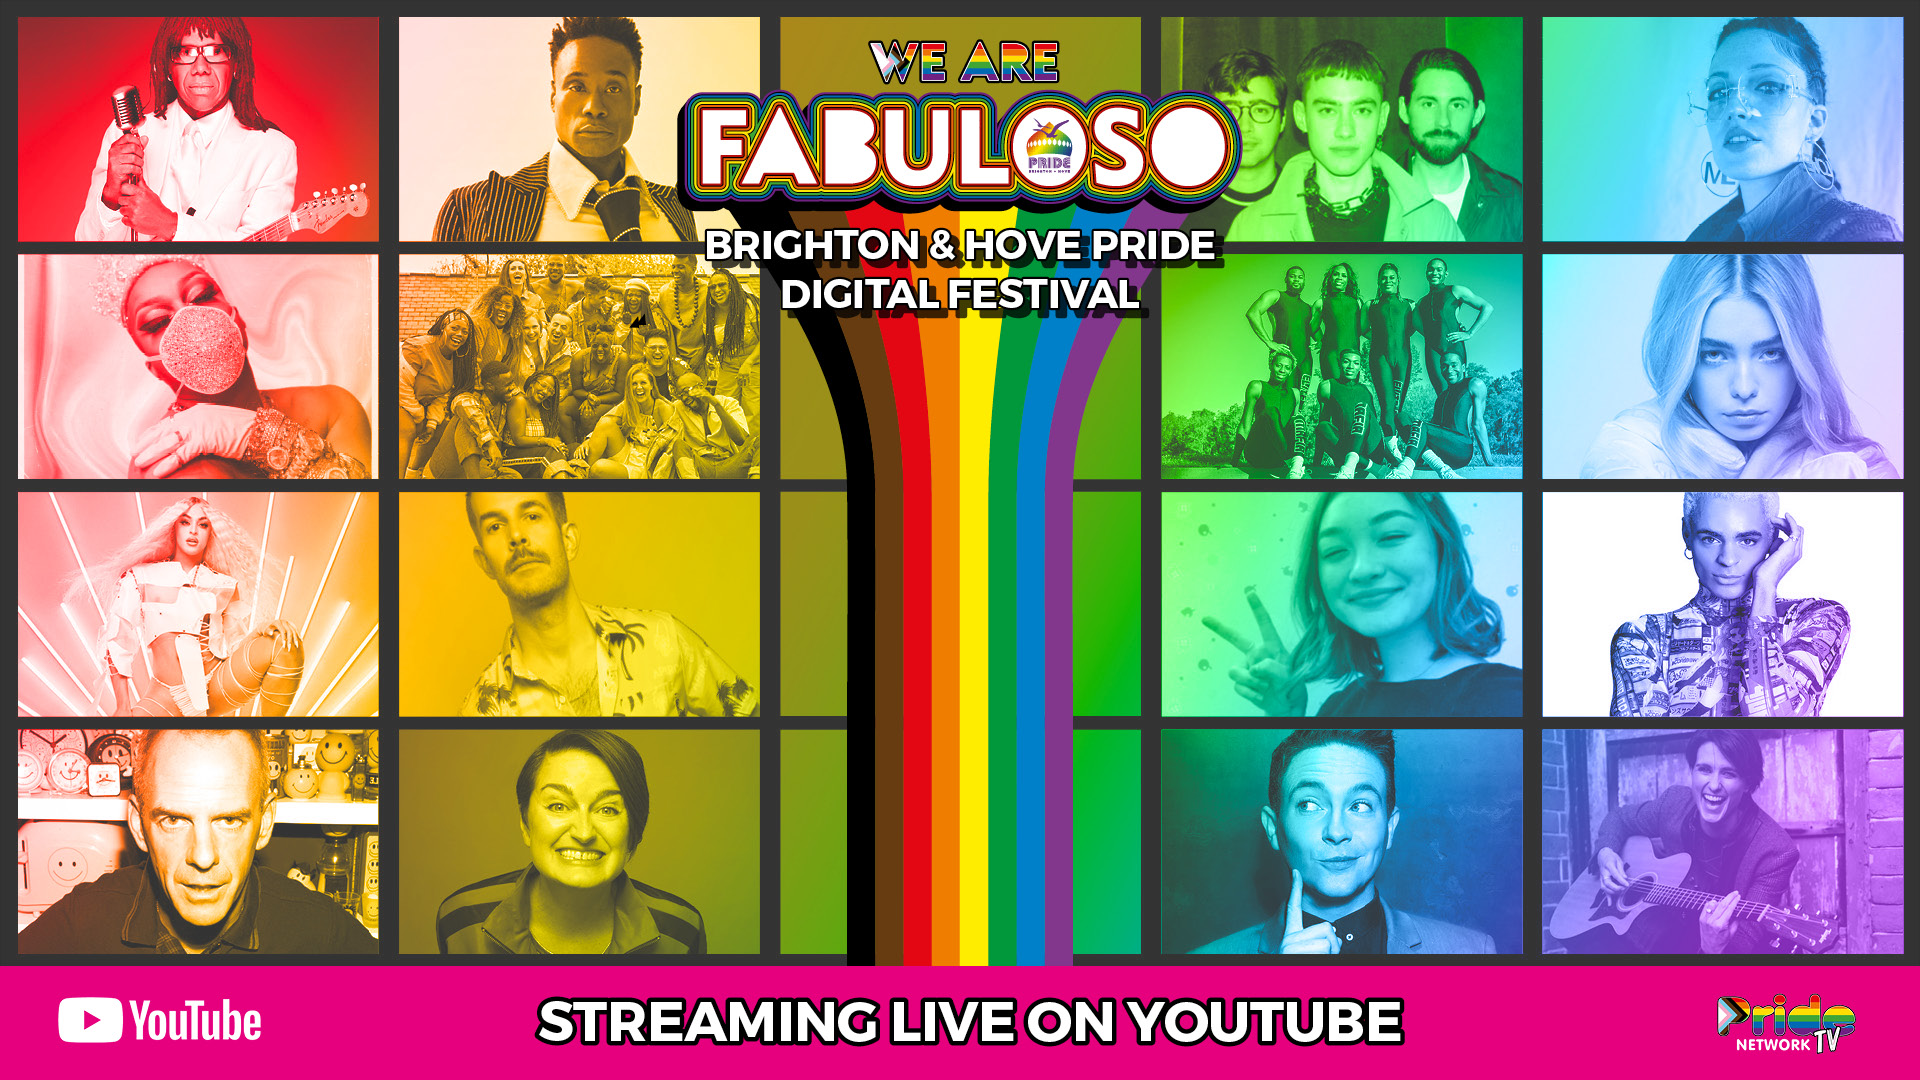 We Are FABULOSO – Full Schedule